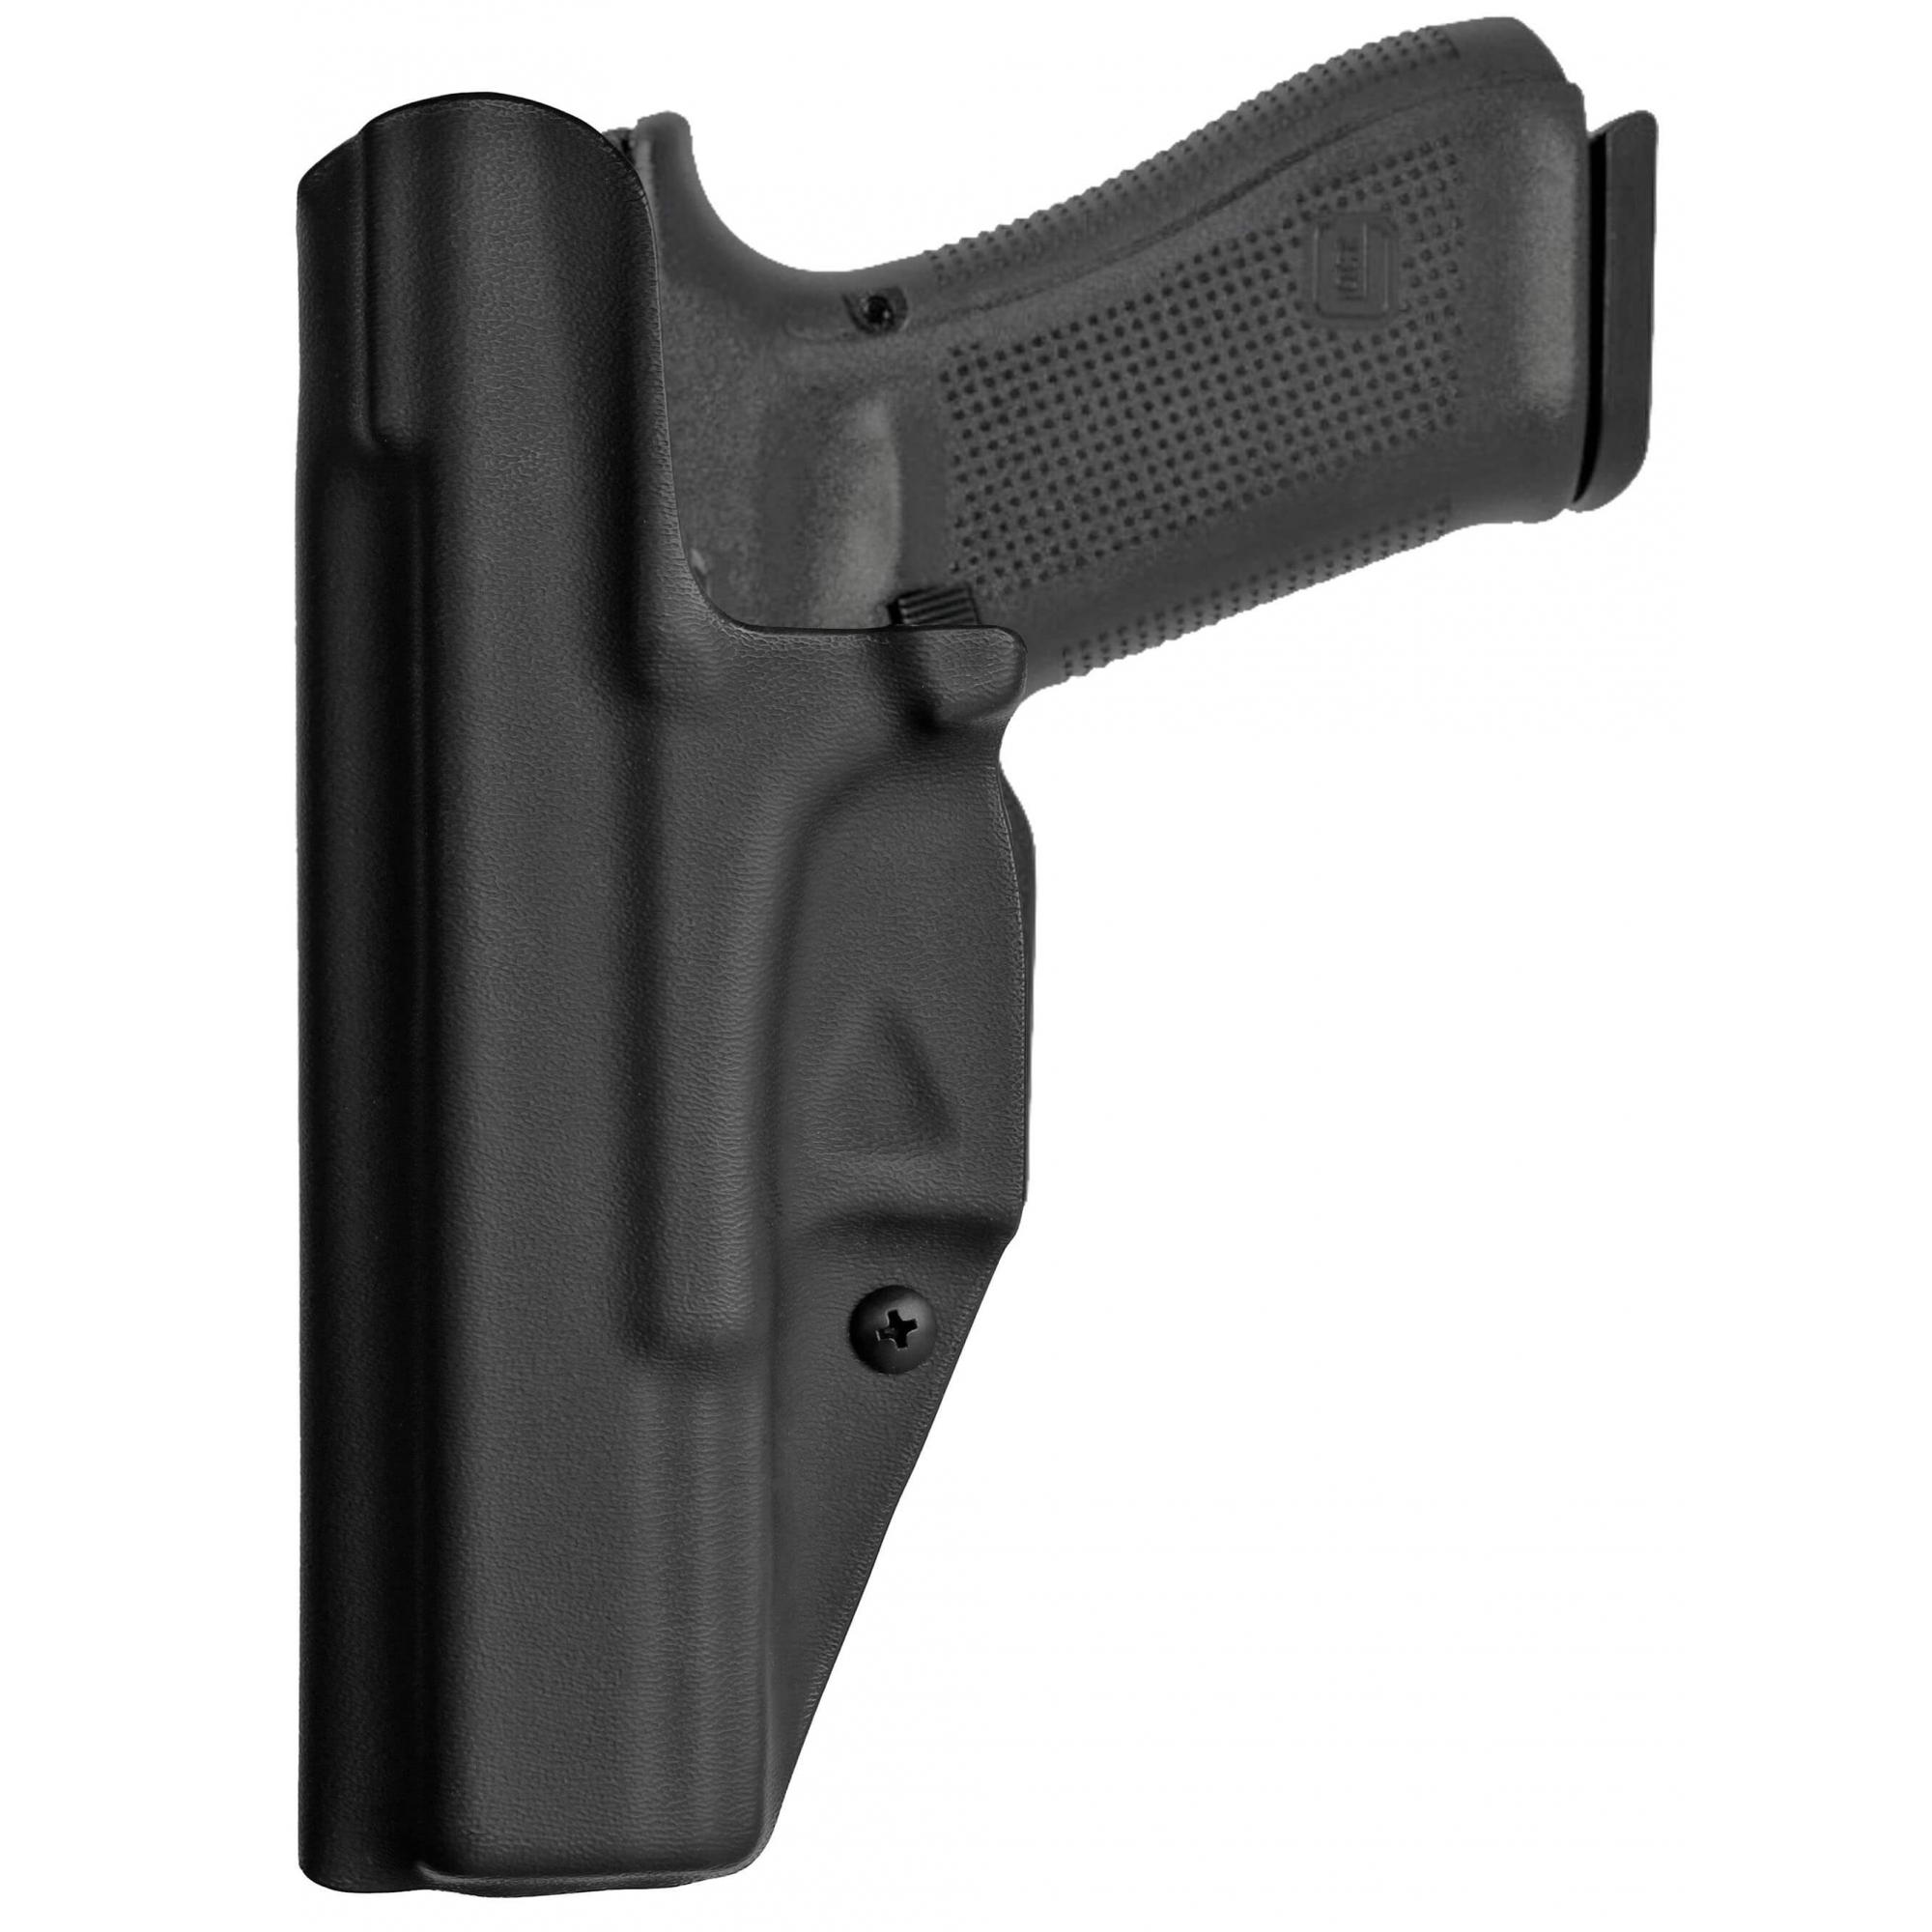 Coldre Glock [G21] [G20] Kydex + 1 Porta-Carregador Universal - Saque Rápido Velado Kydex® 080